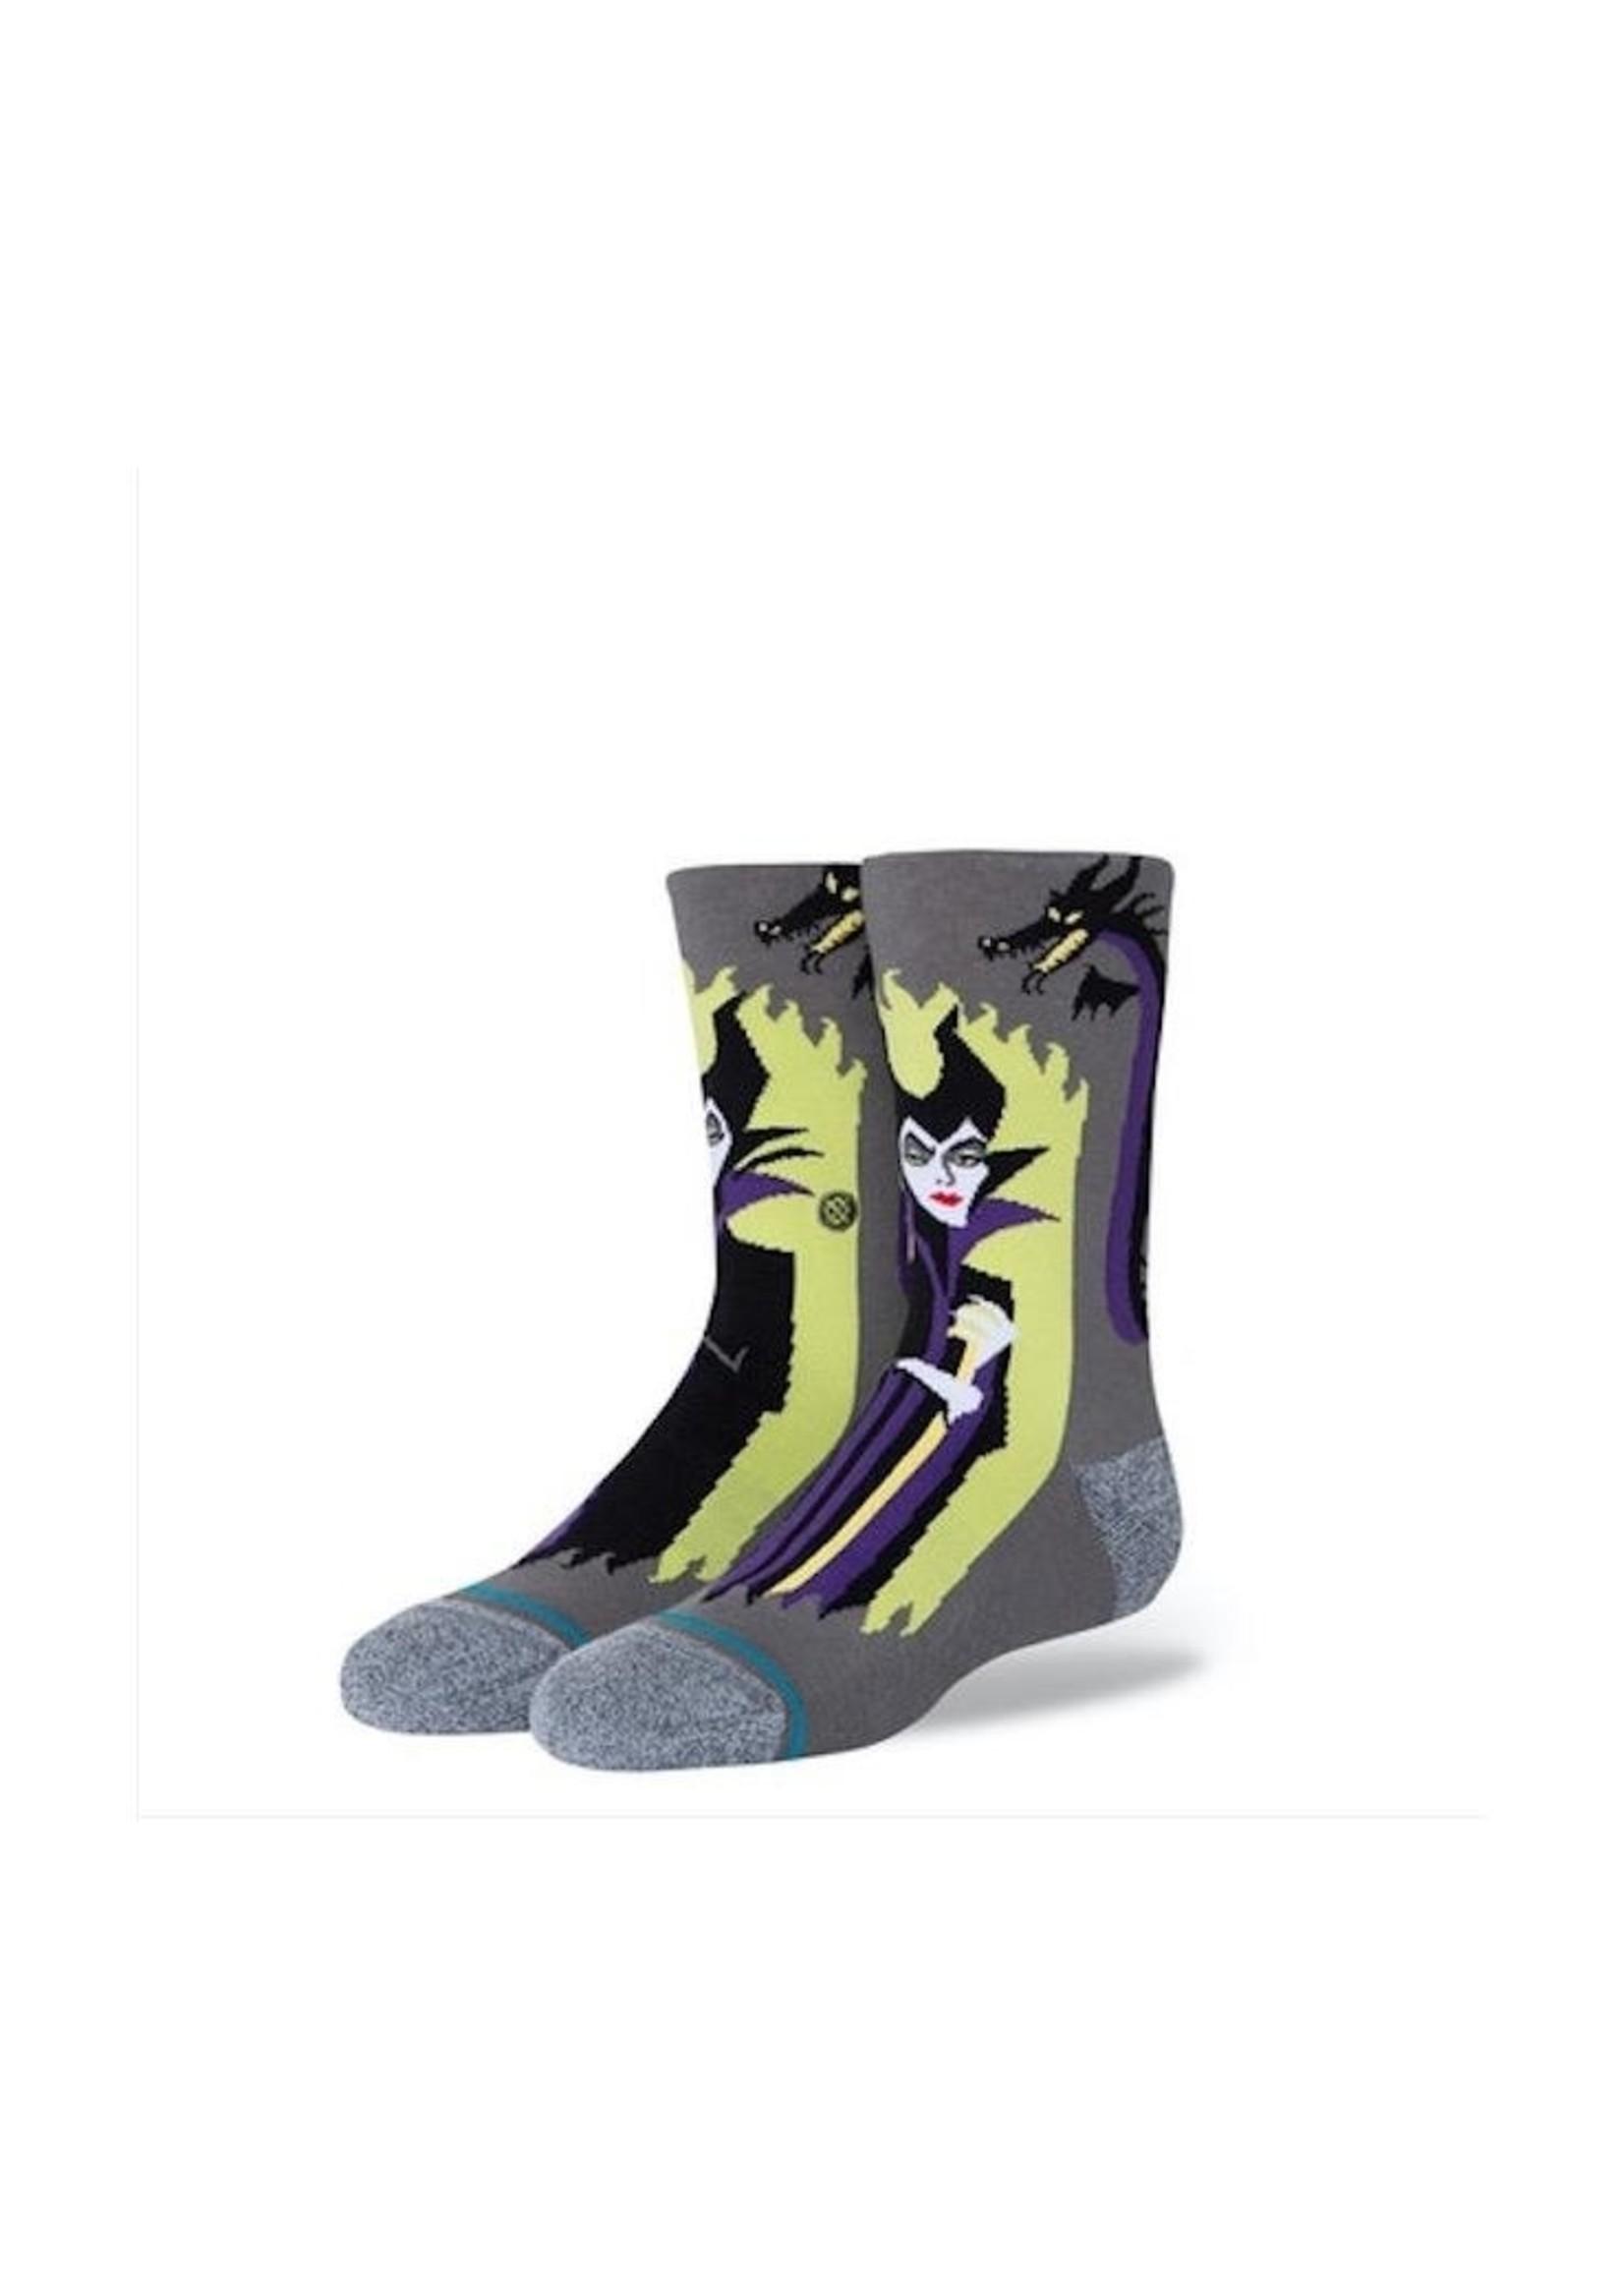 Stance Socks Stance, Disney Infiknit Socks, Maleficent